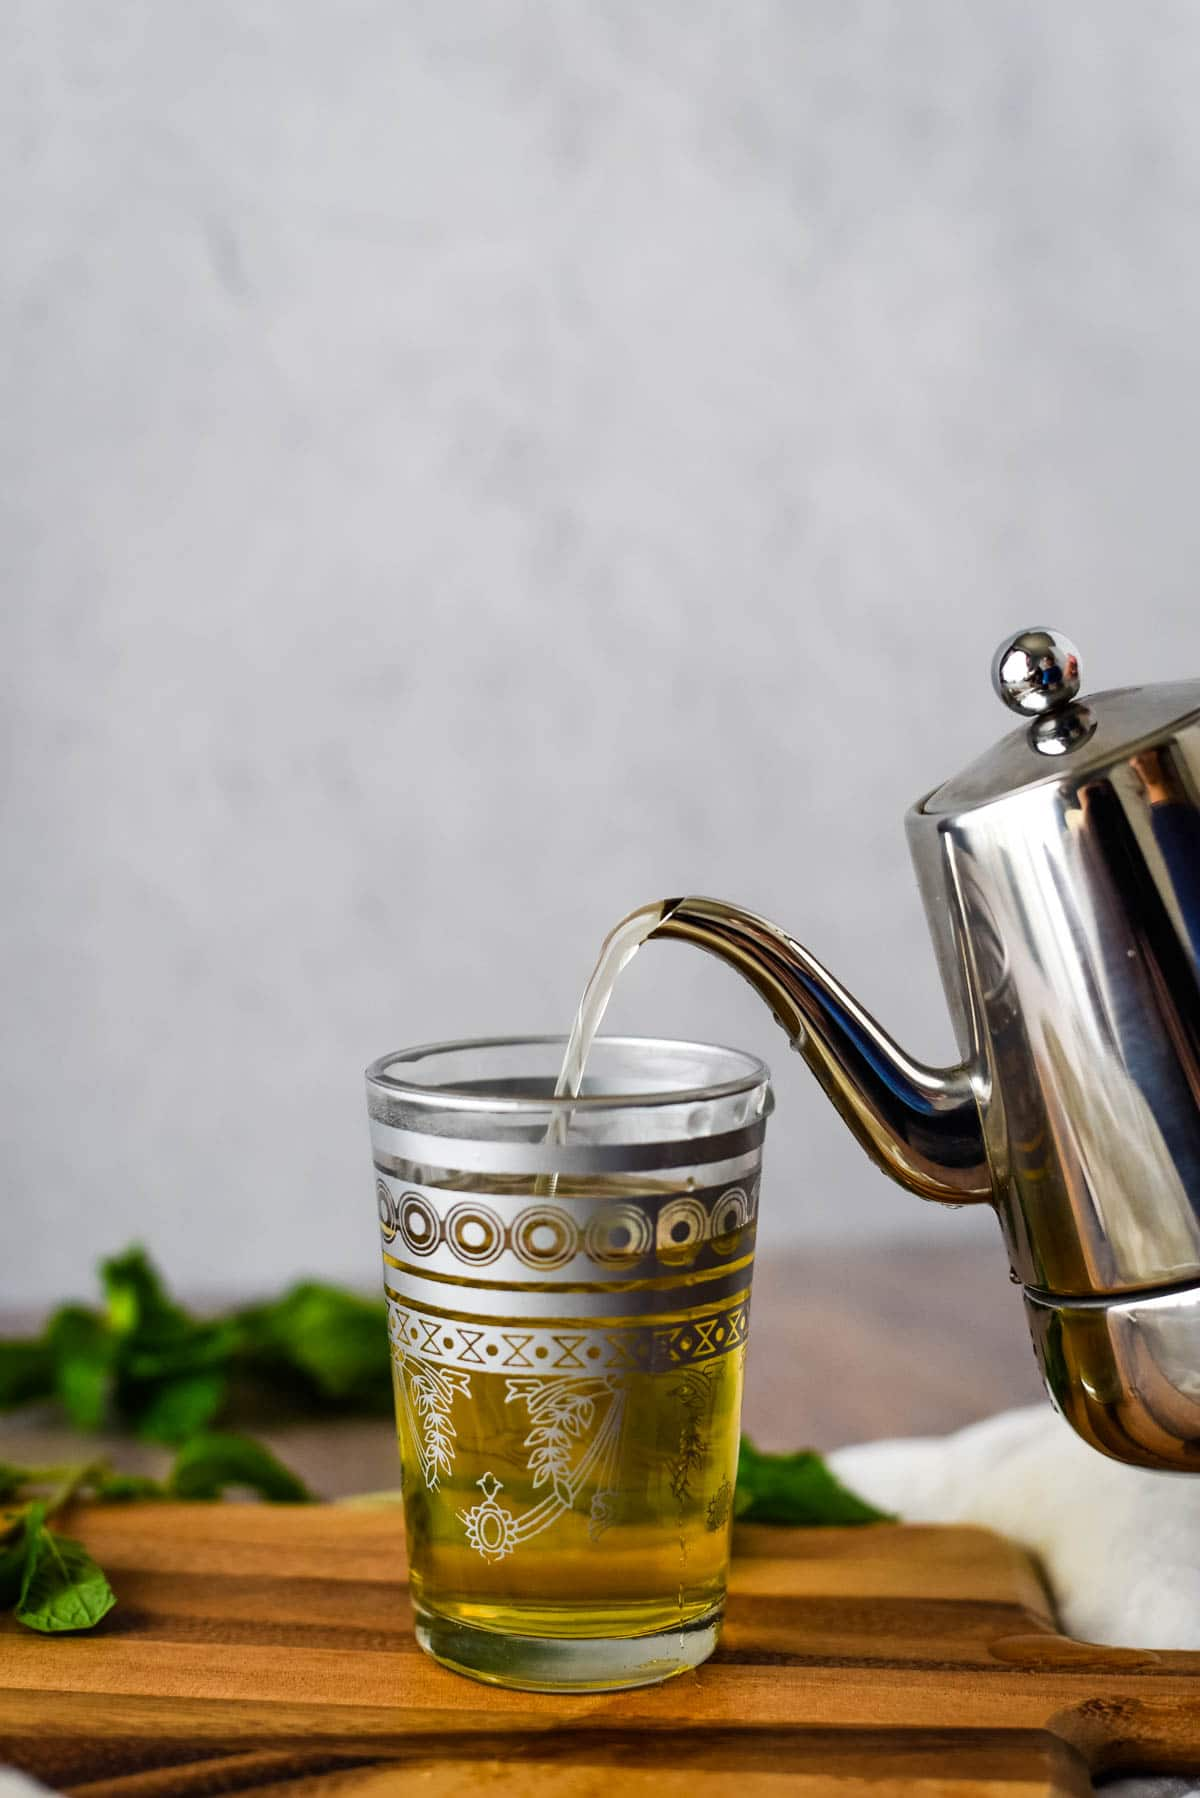 silver tea pot pouring into glass